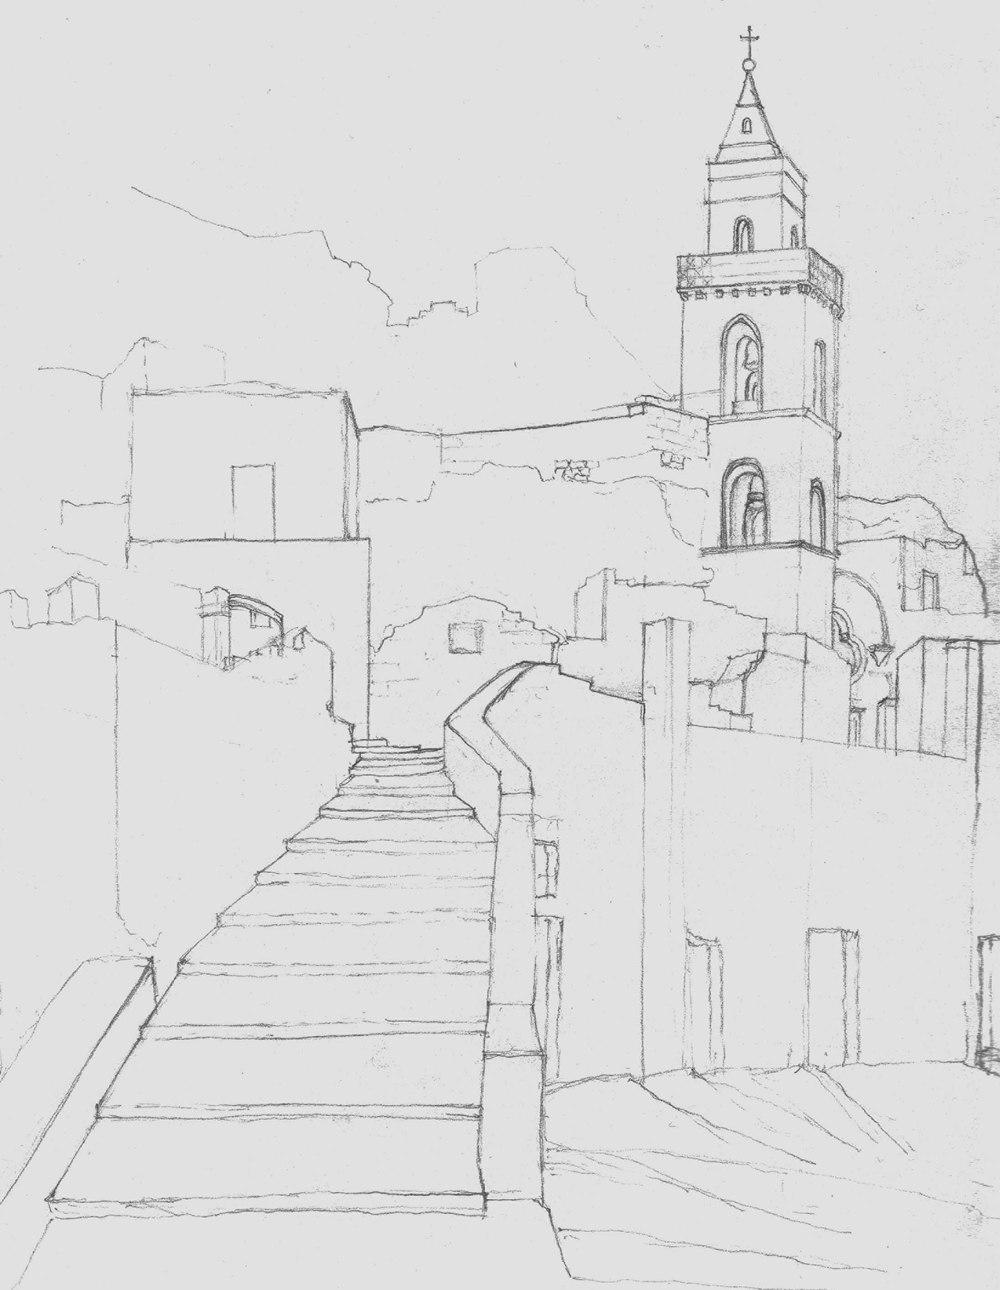 sassi matera sketch  copyright sophia khan_edited-1.jpg